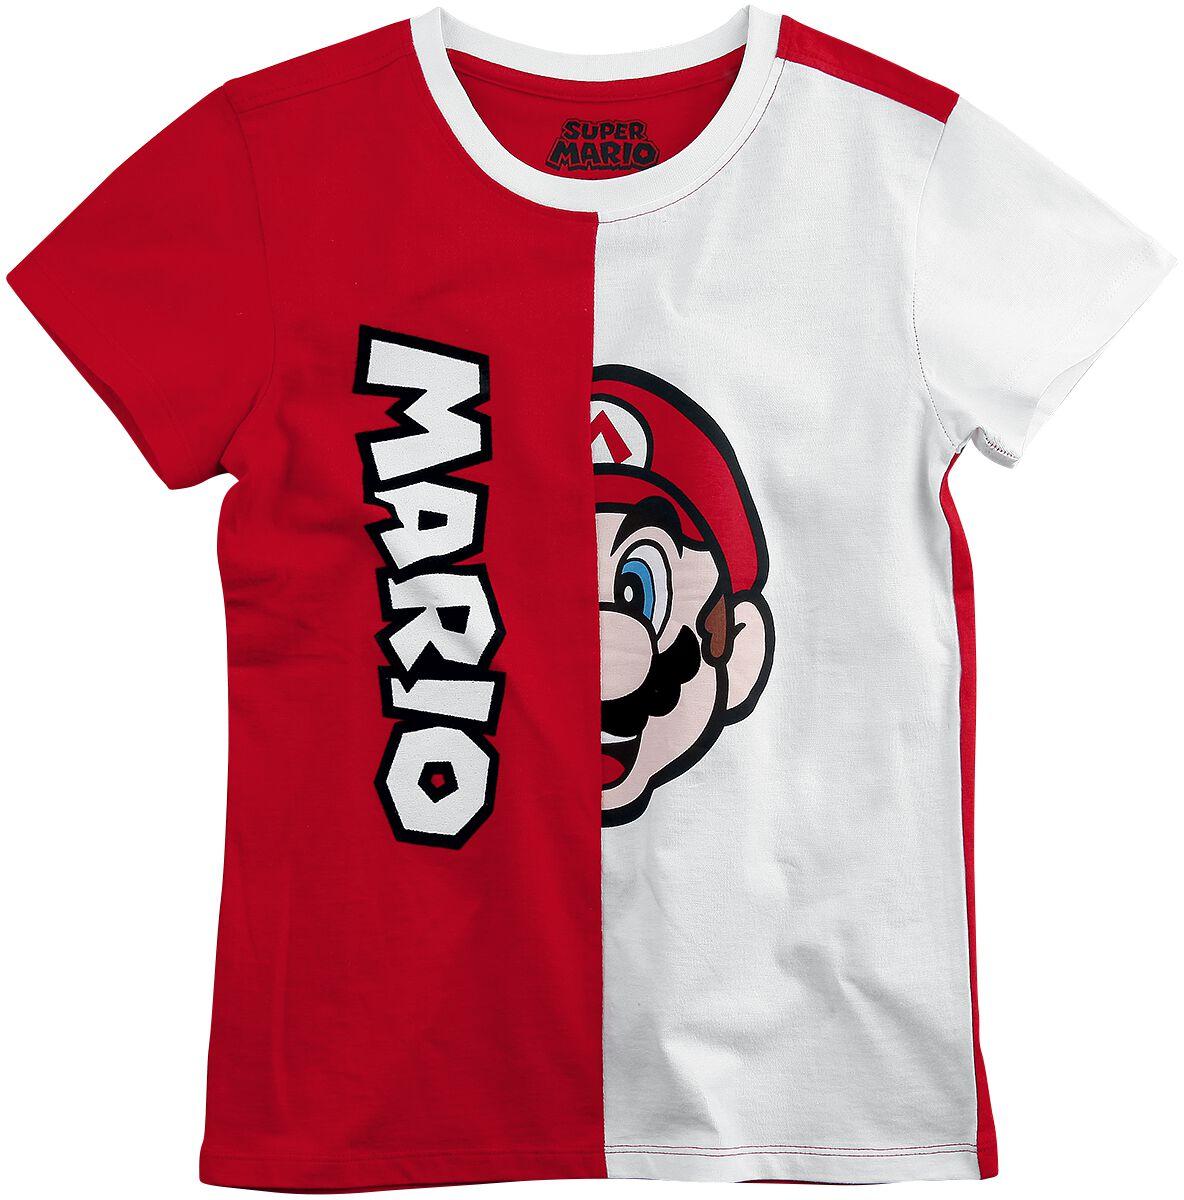 Image of   Super Mario Mario Børnetrøje rød-hvid